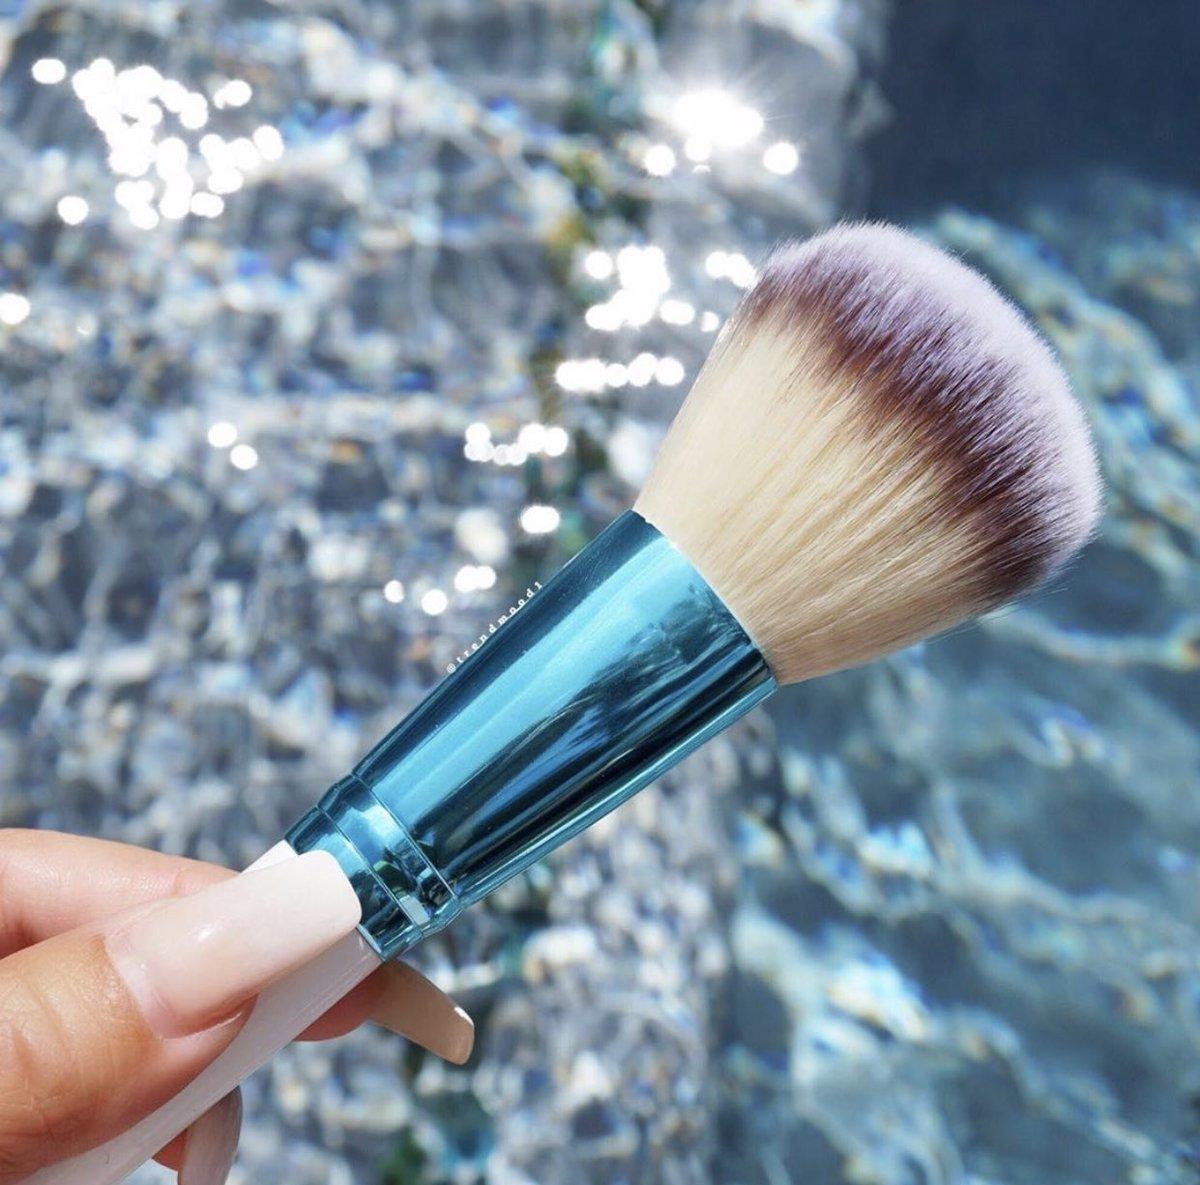 BH Cosmetics Poolside Chic 12 piece brush set